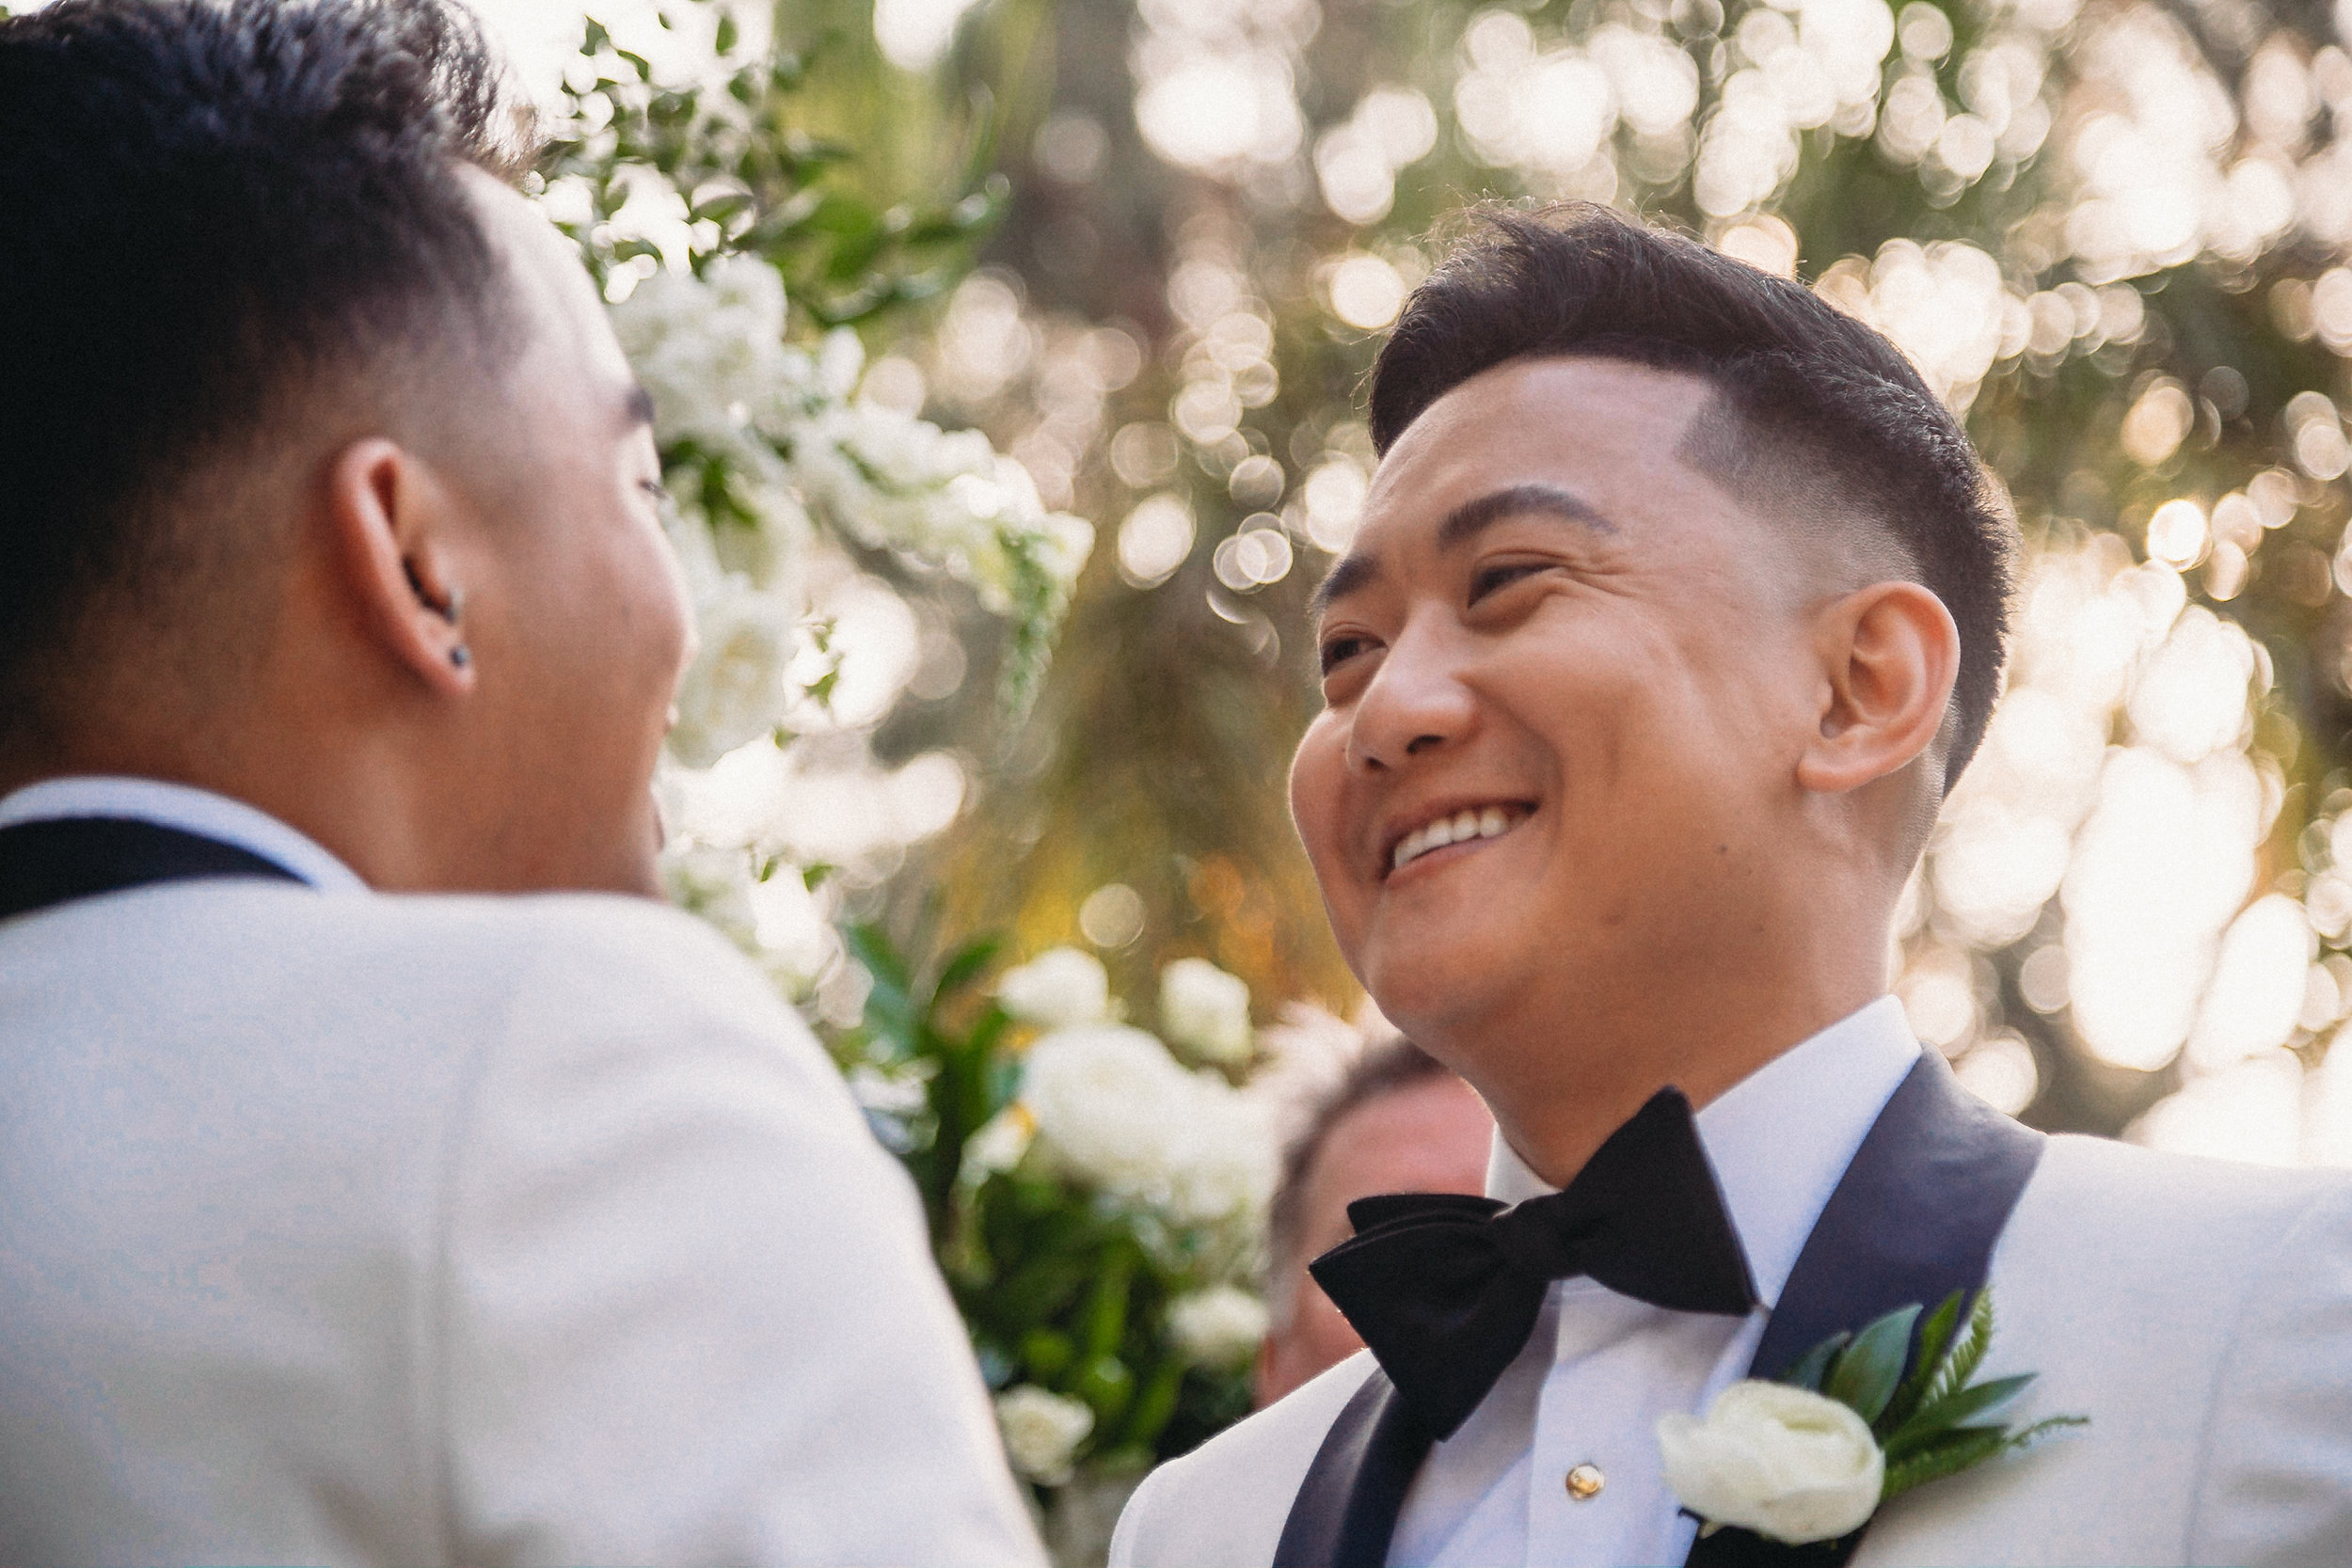 rebeccaylasotras-sandiego-lgbt-wedding-photography-55.jpg